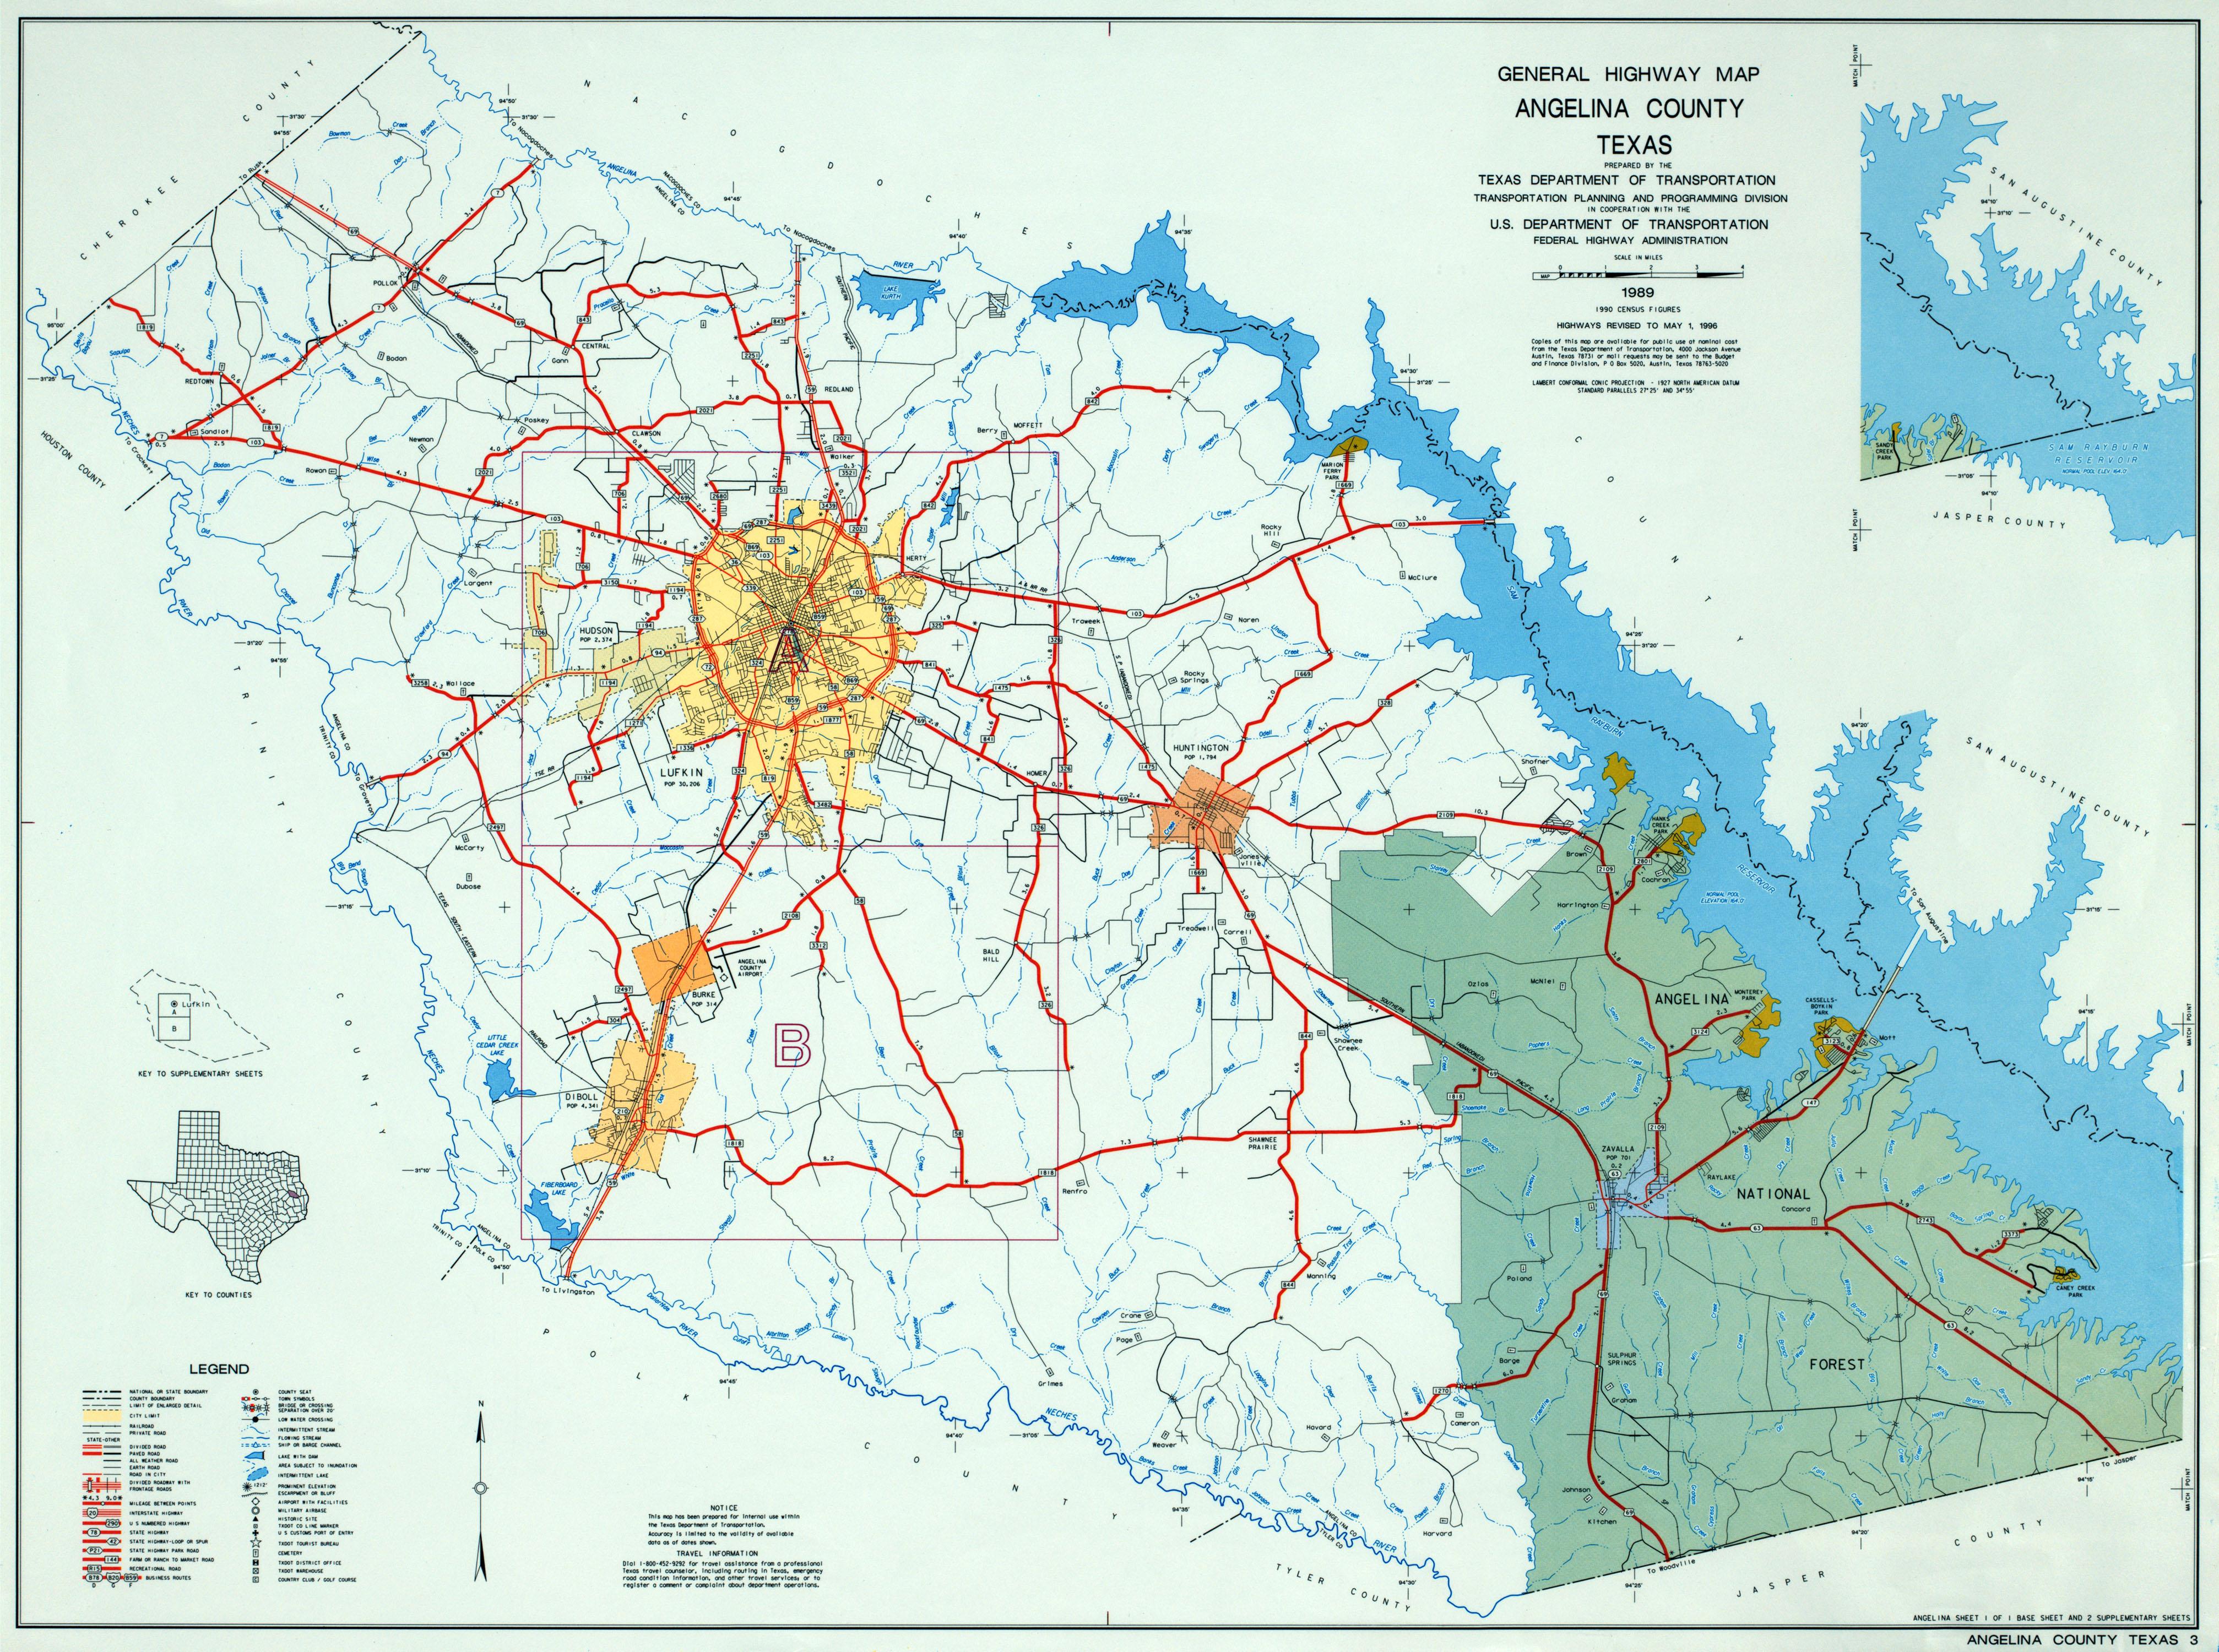 Texas County Highway Maps Browse PerryCastañeda Map Collection - County maps texas